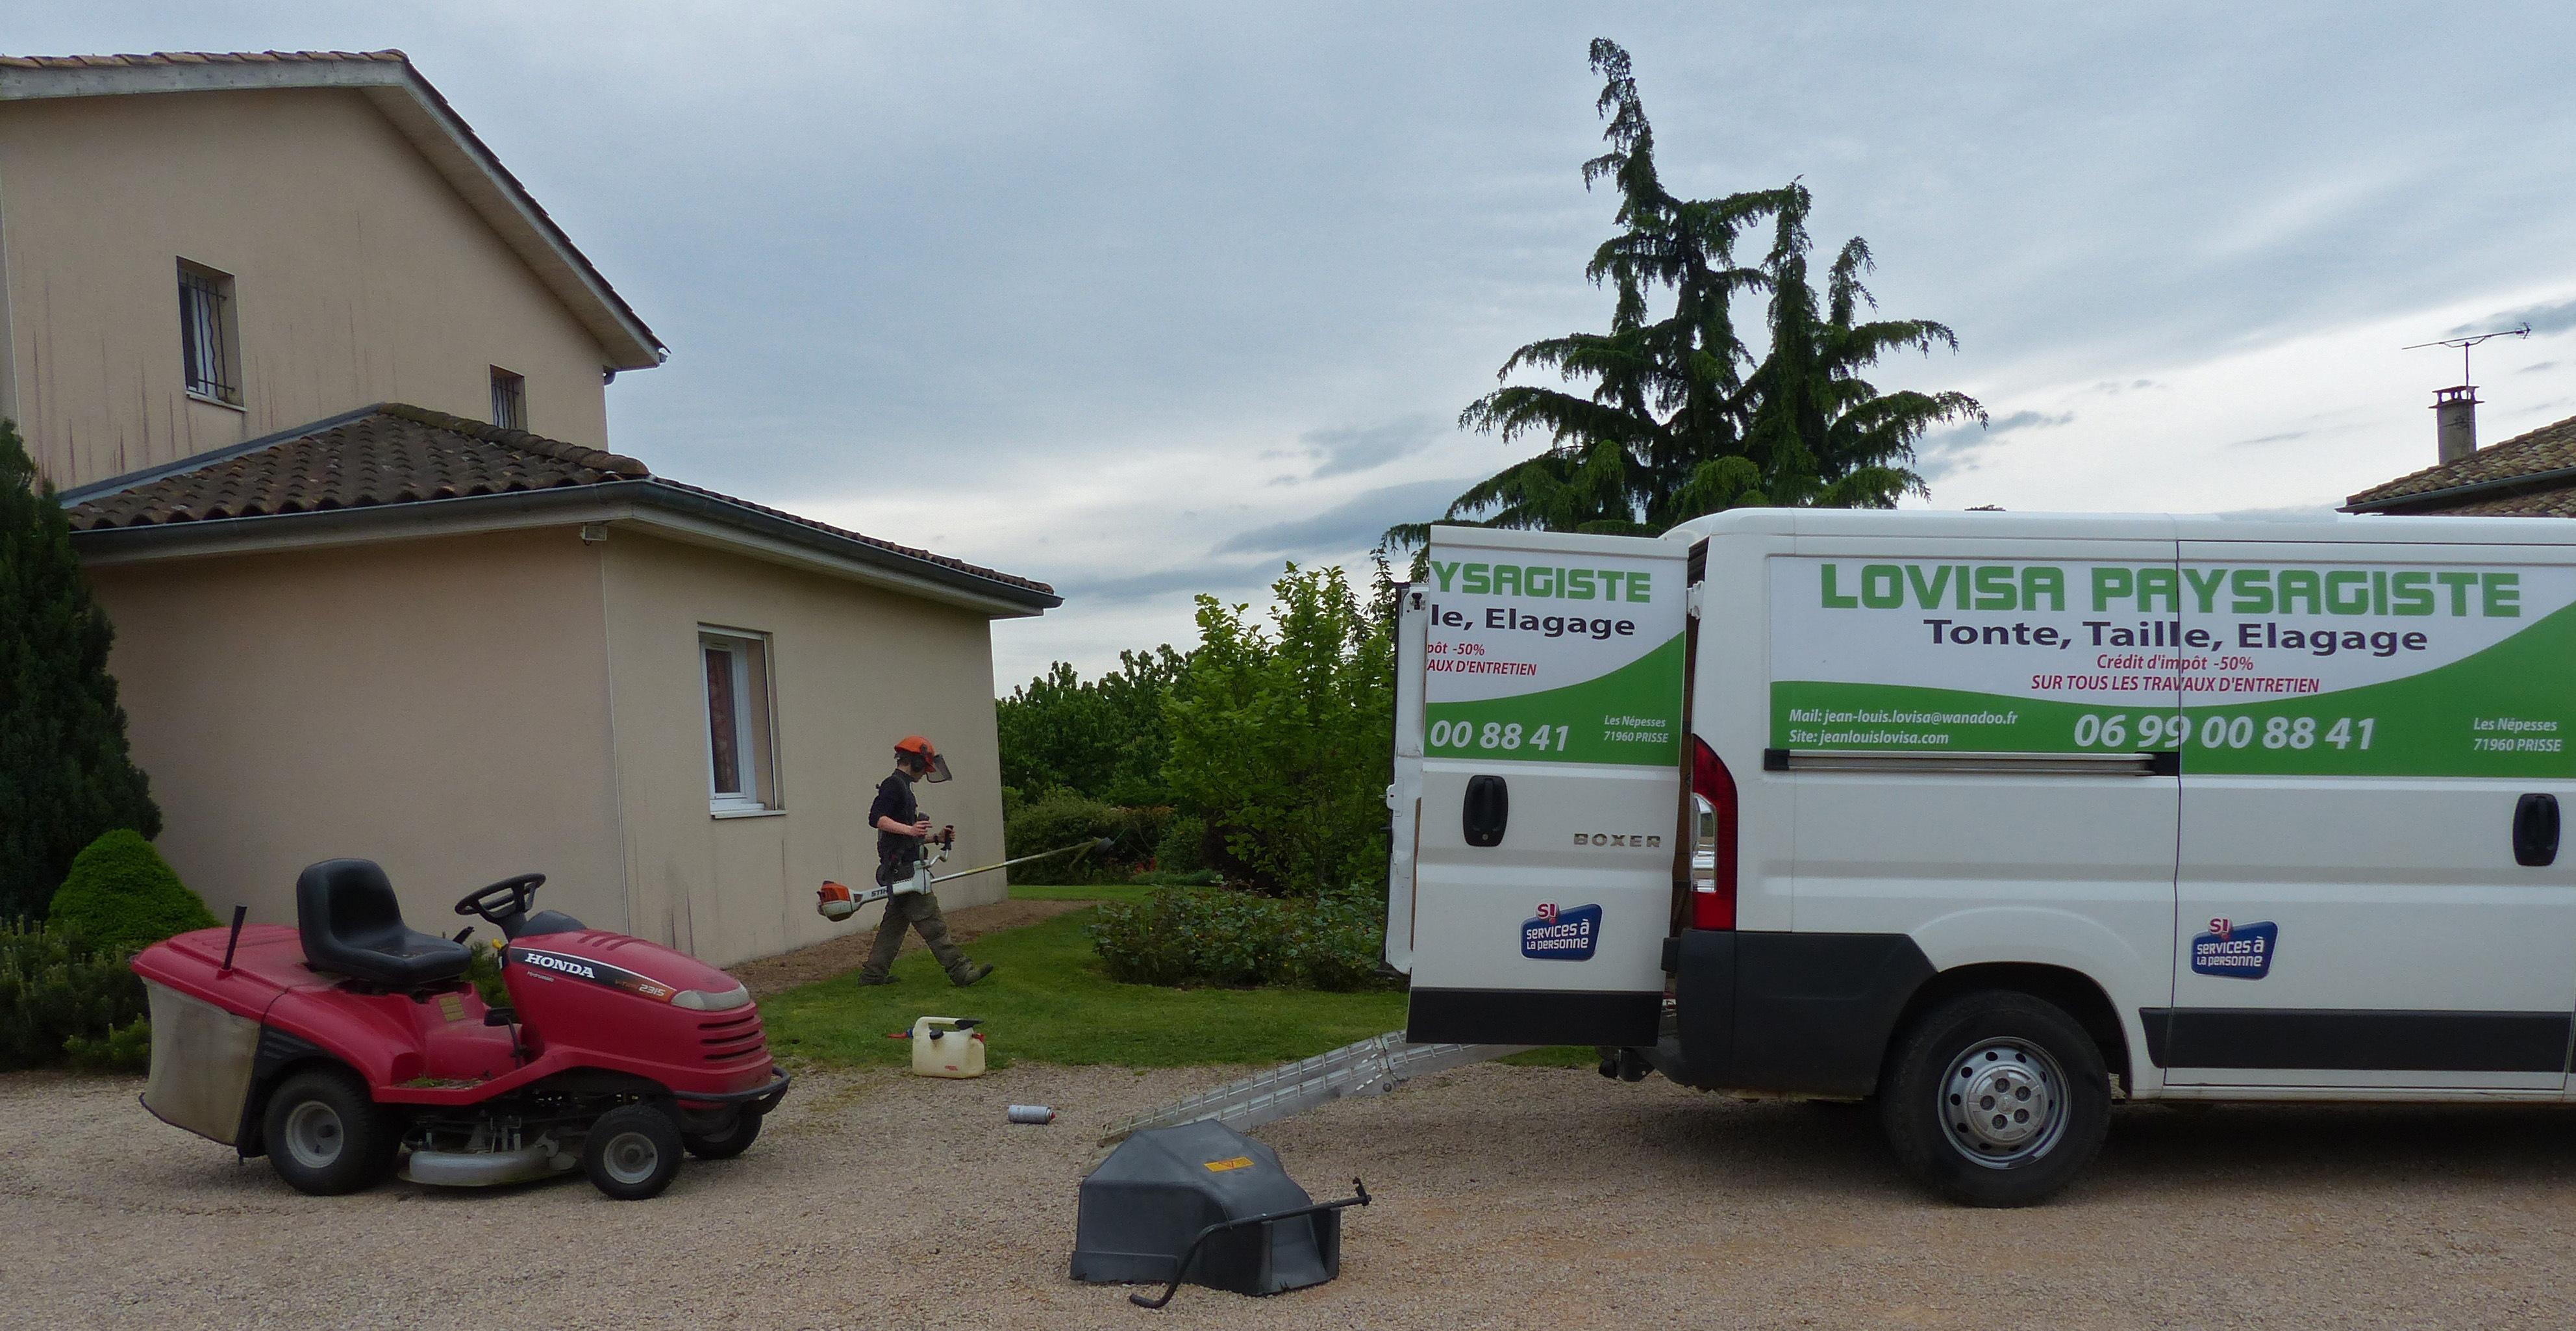 Lovisa lovisa jean louis paysagiste en france paysagiste for Jardinier paysagiste 71